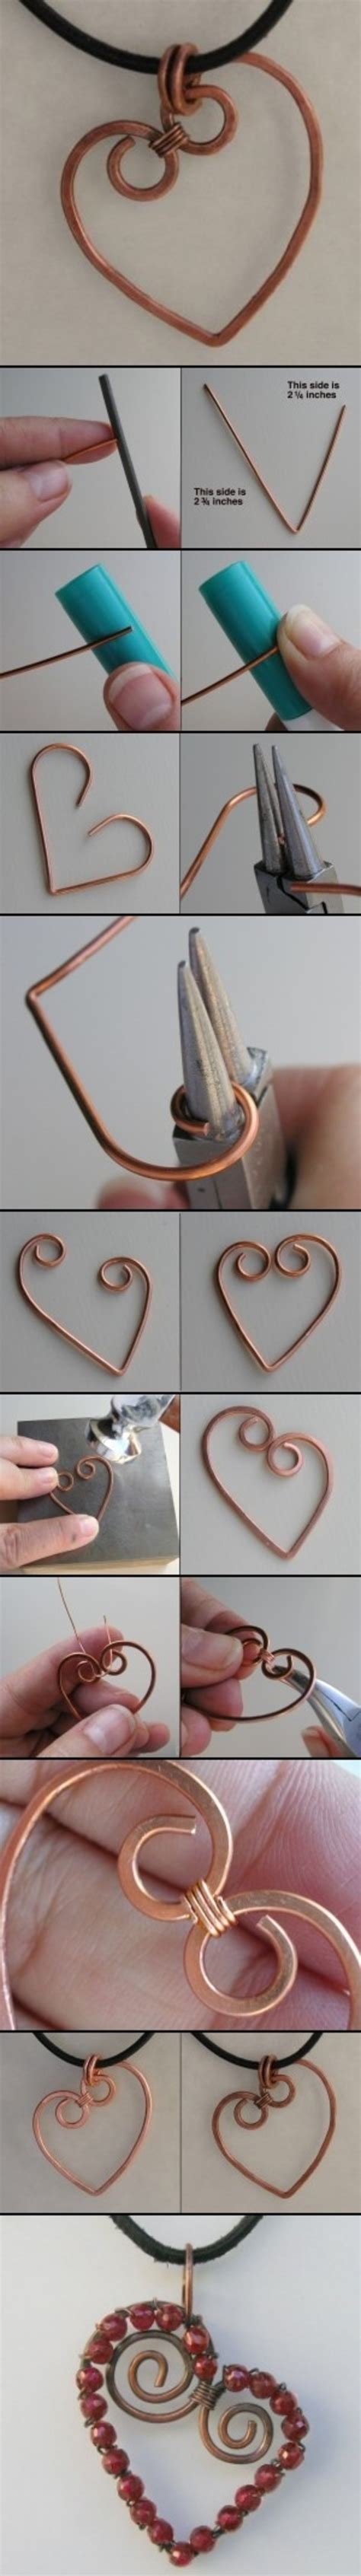 creative jewelry ideas 10 creative jewelry crafts and ideas